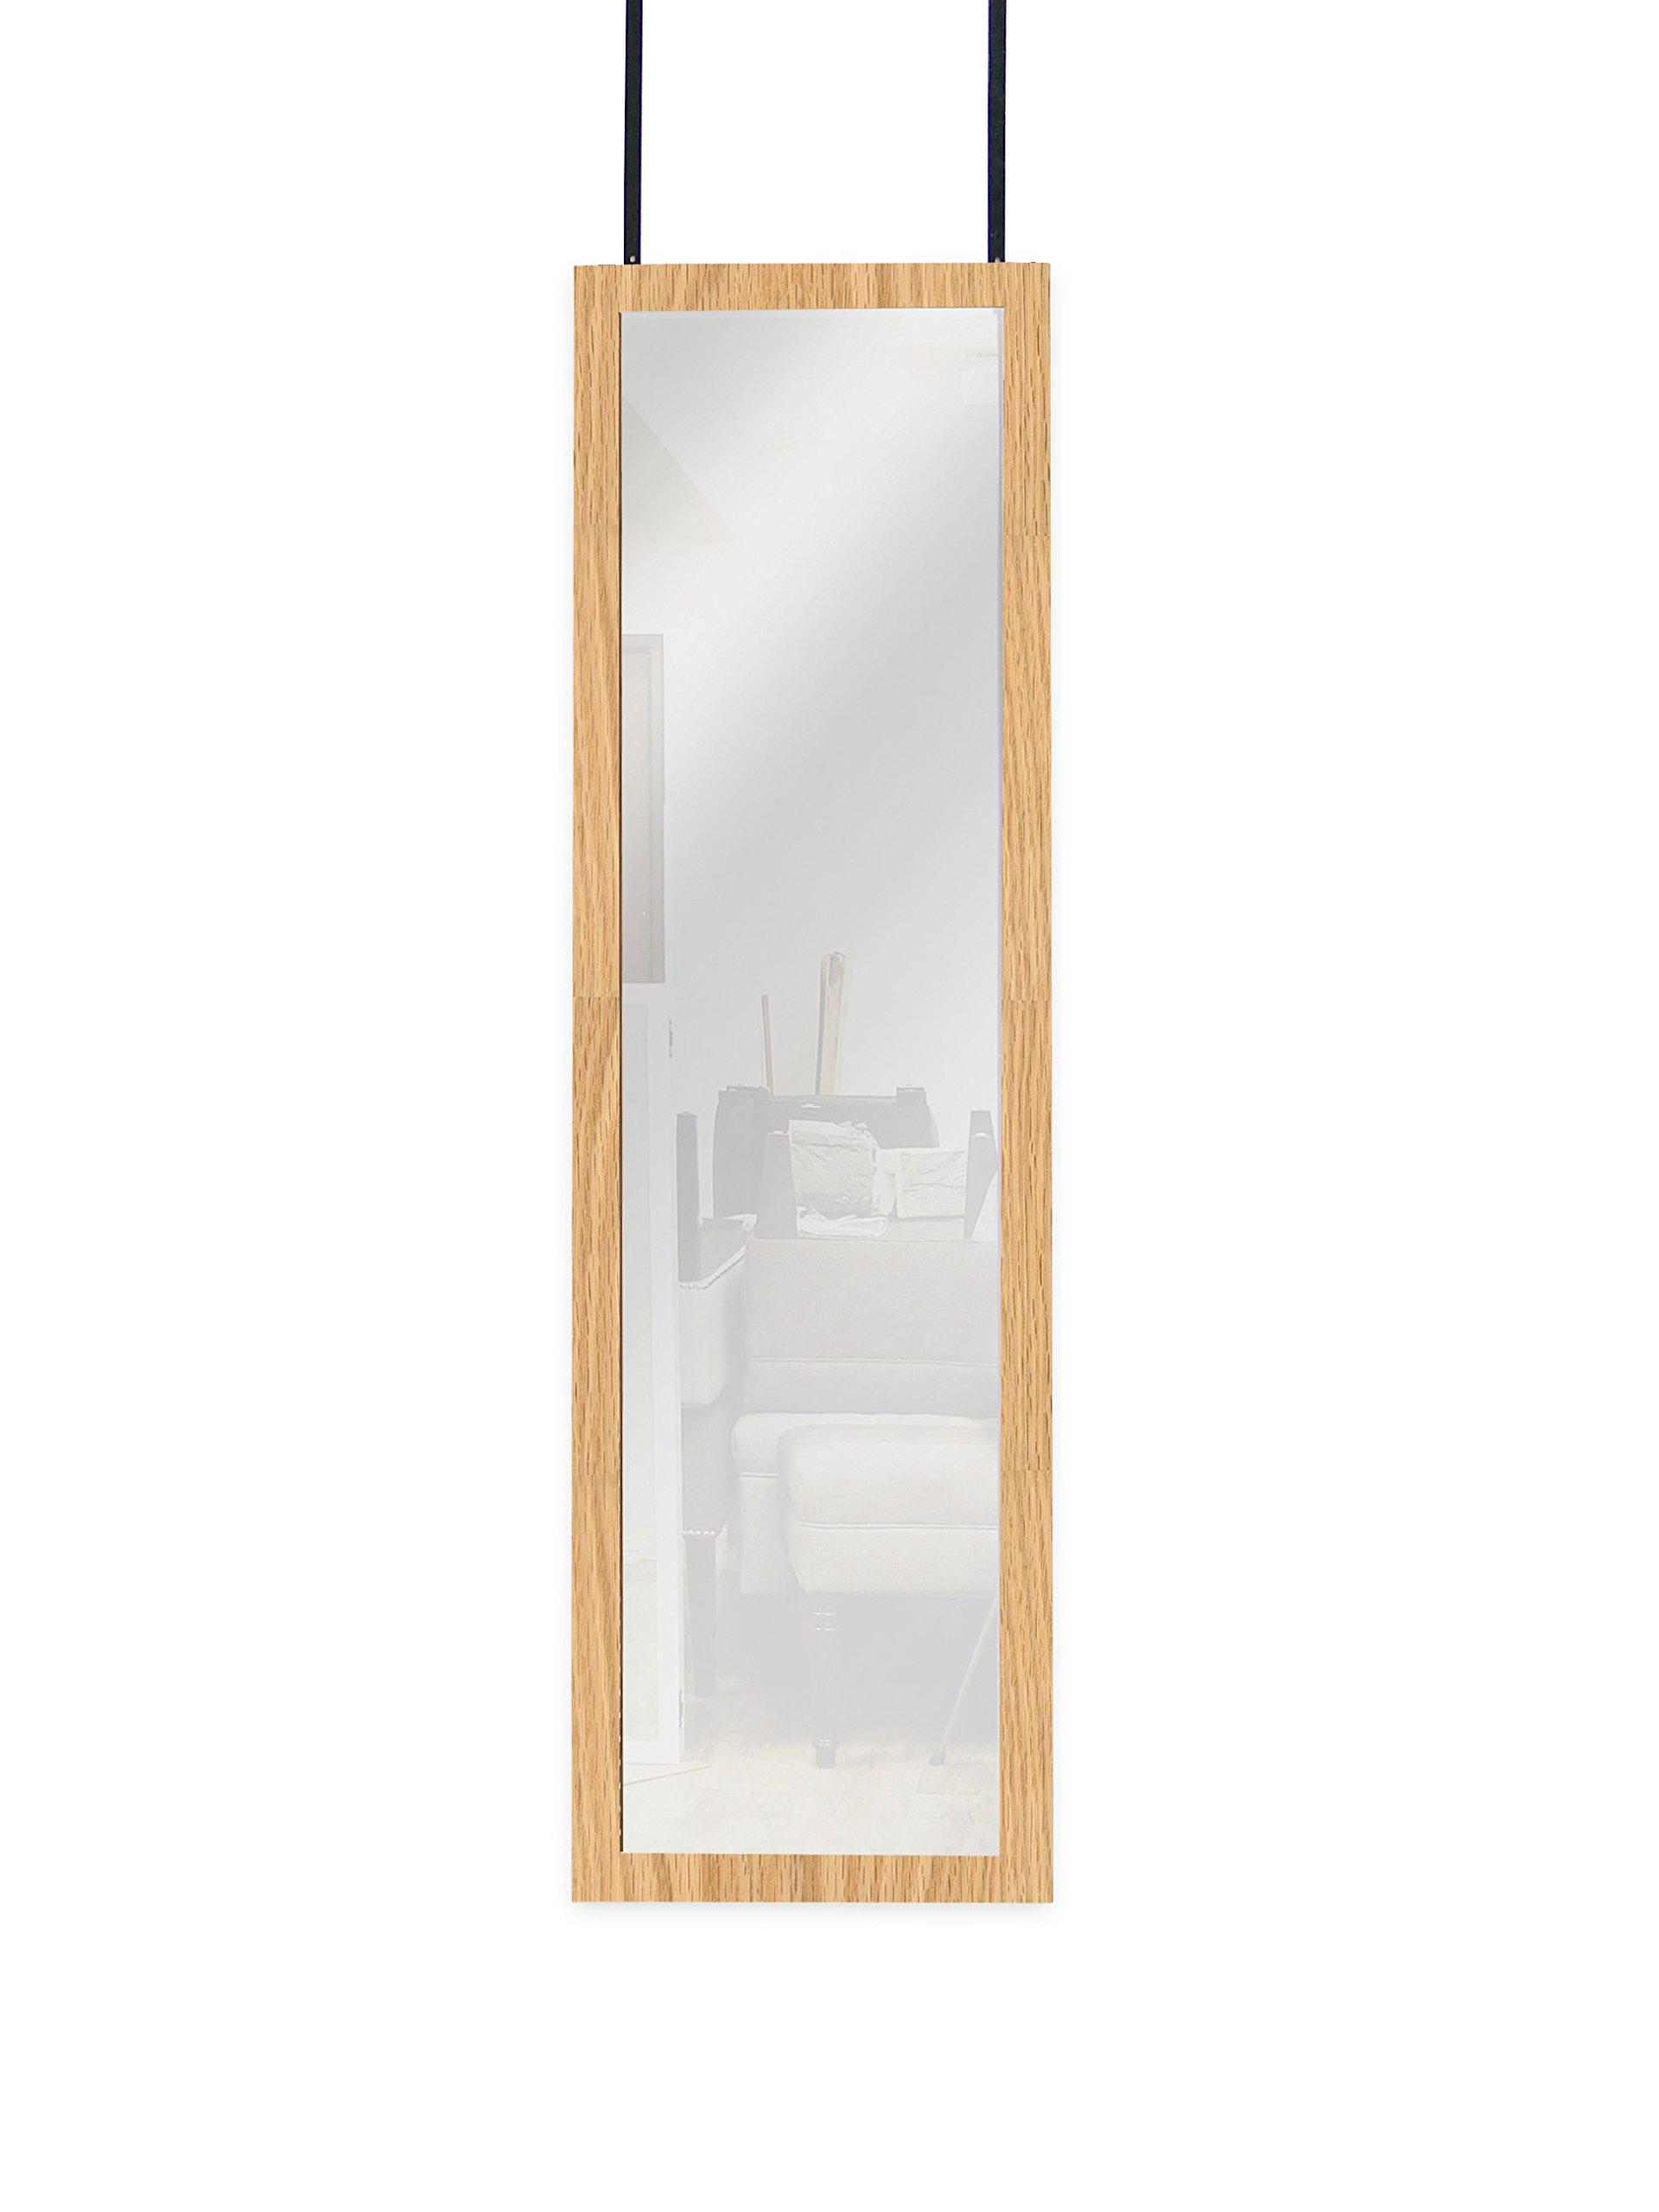 ArtMuseKitsMikash Mirrotek Over The Door Wall Mounted Full Length Door Dressing Mirror, Hardware Included, Oak Finish by Mirrotek